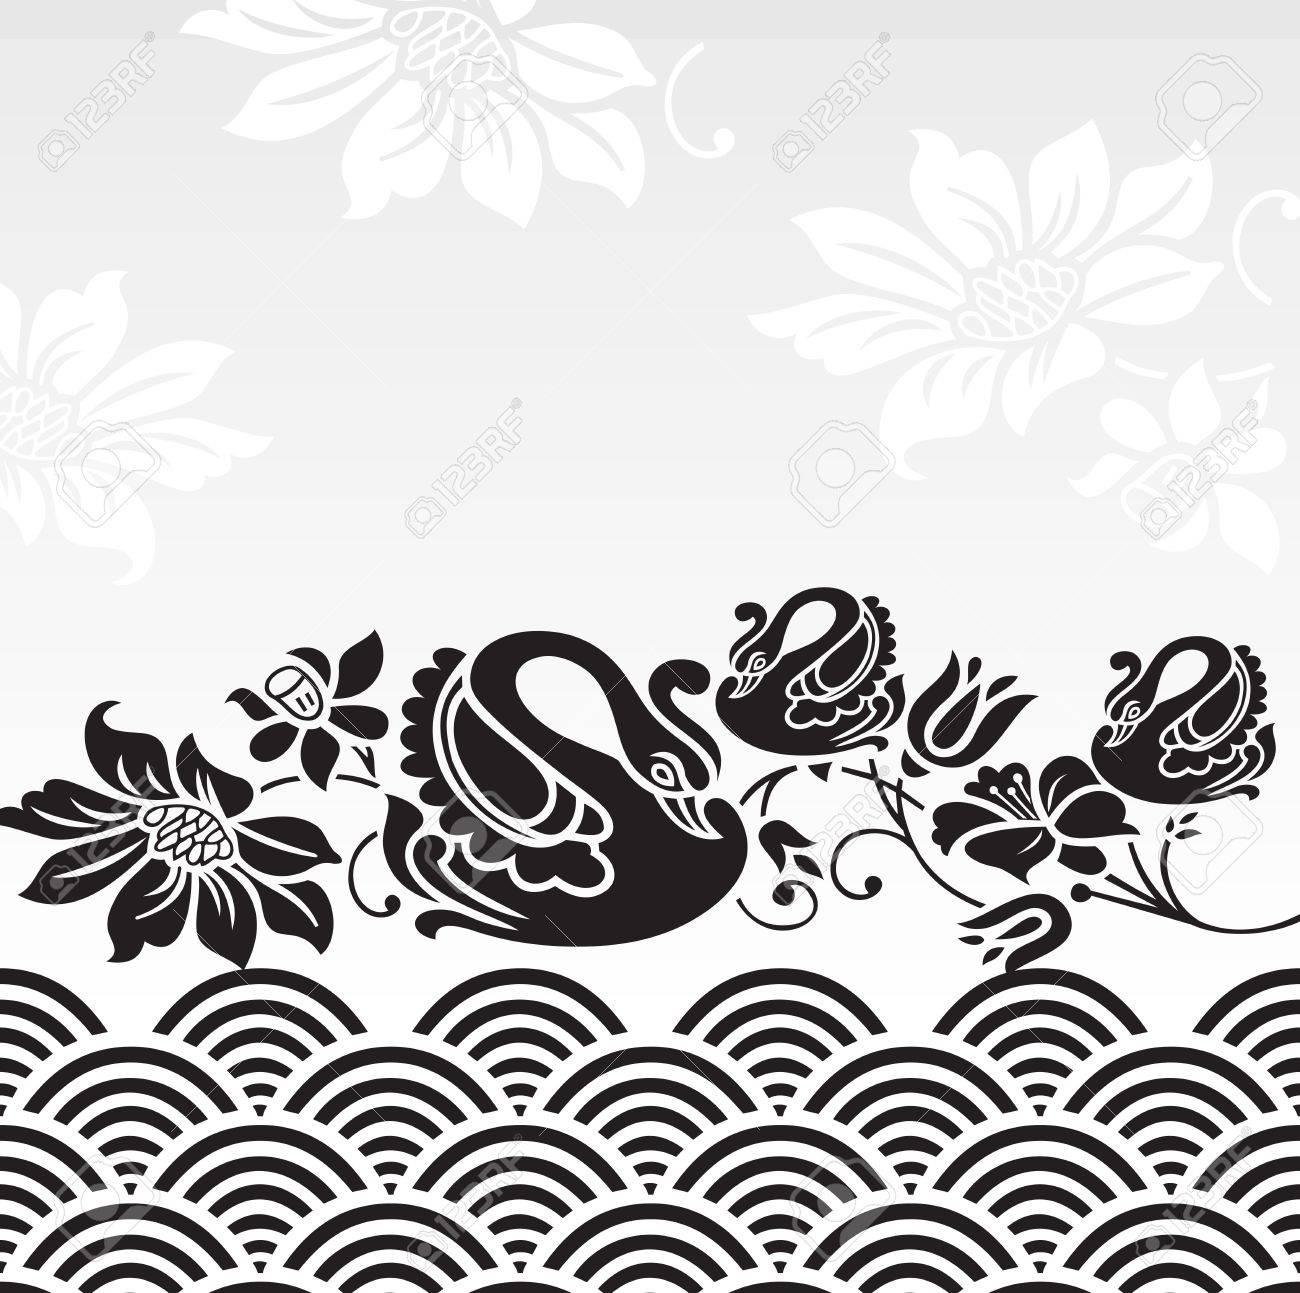 swan clipart.html